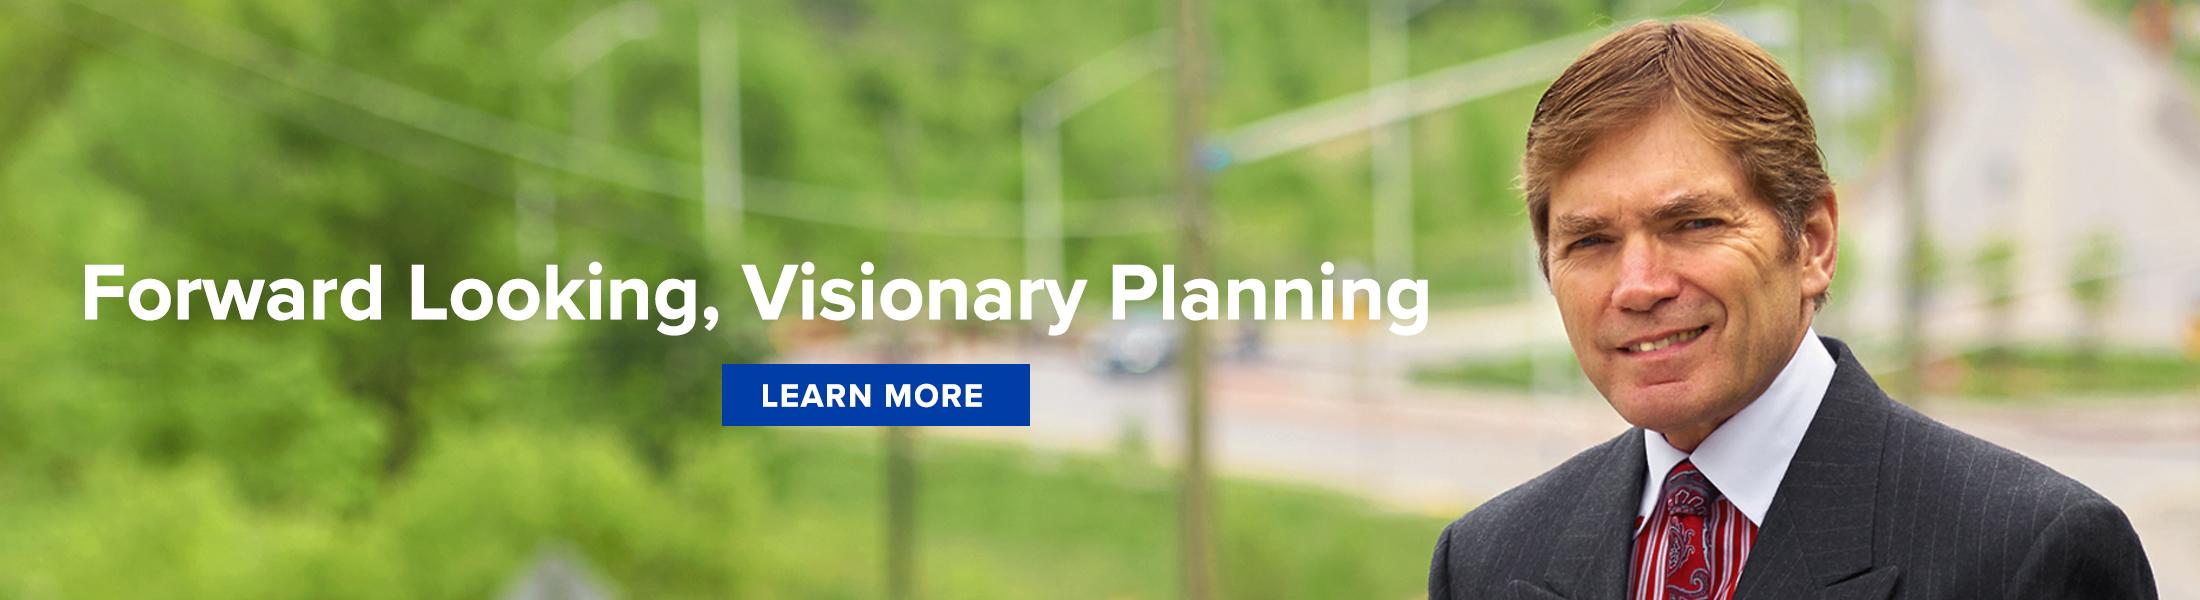 John Challinor Town of Milton Ward 2 Forward Looking, Visionary Planning